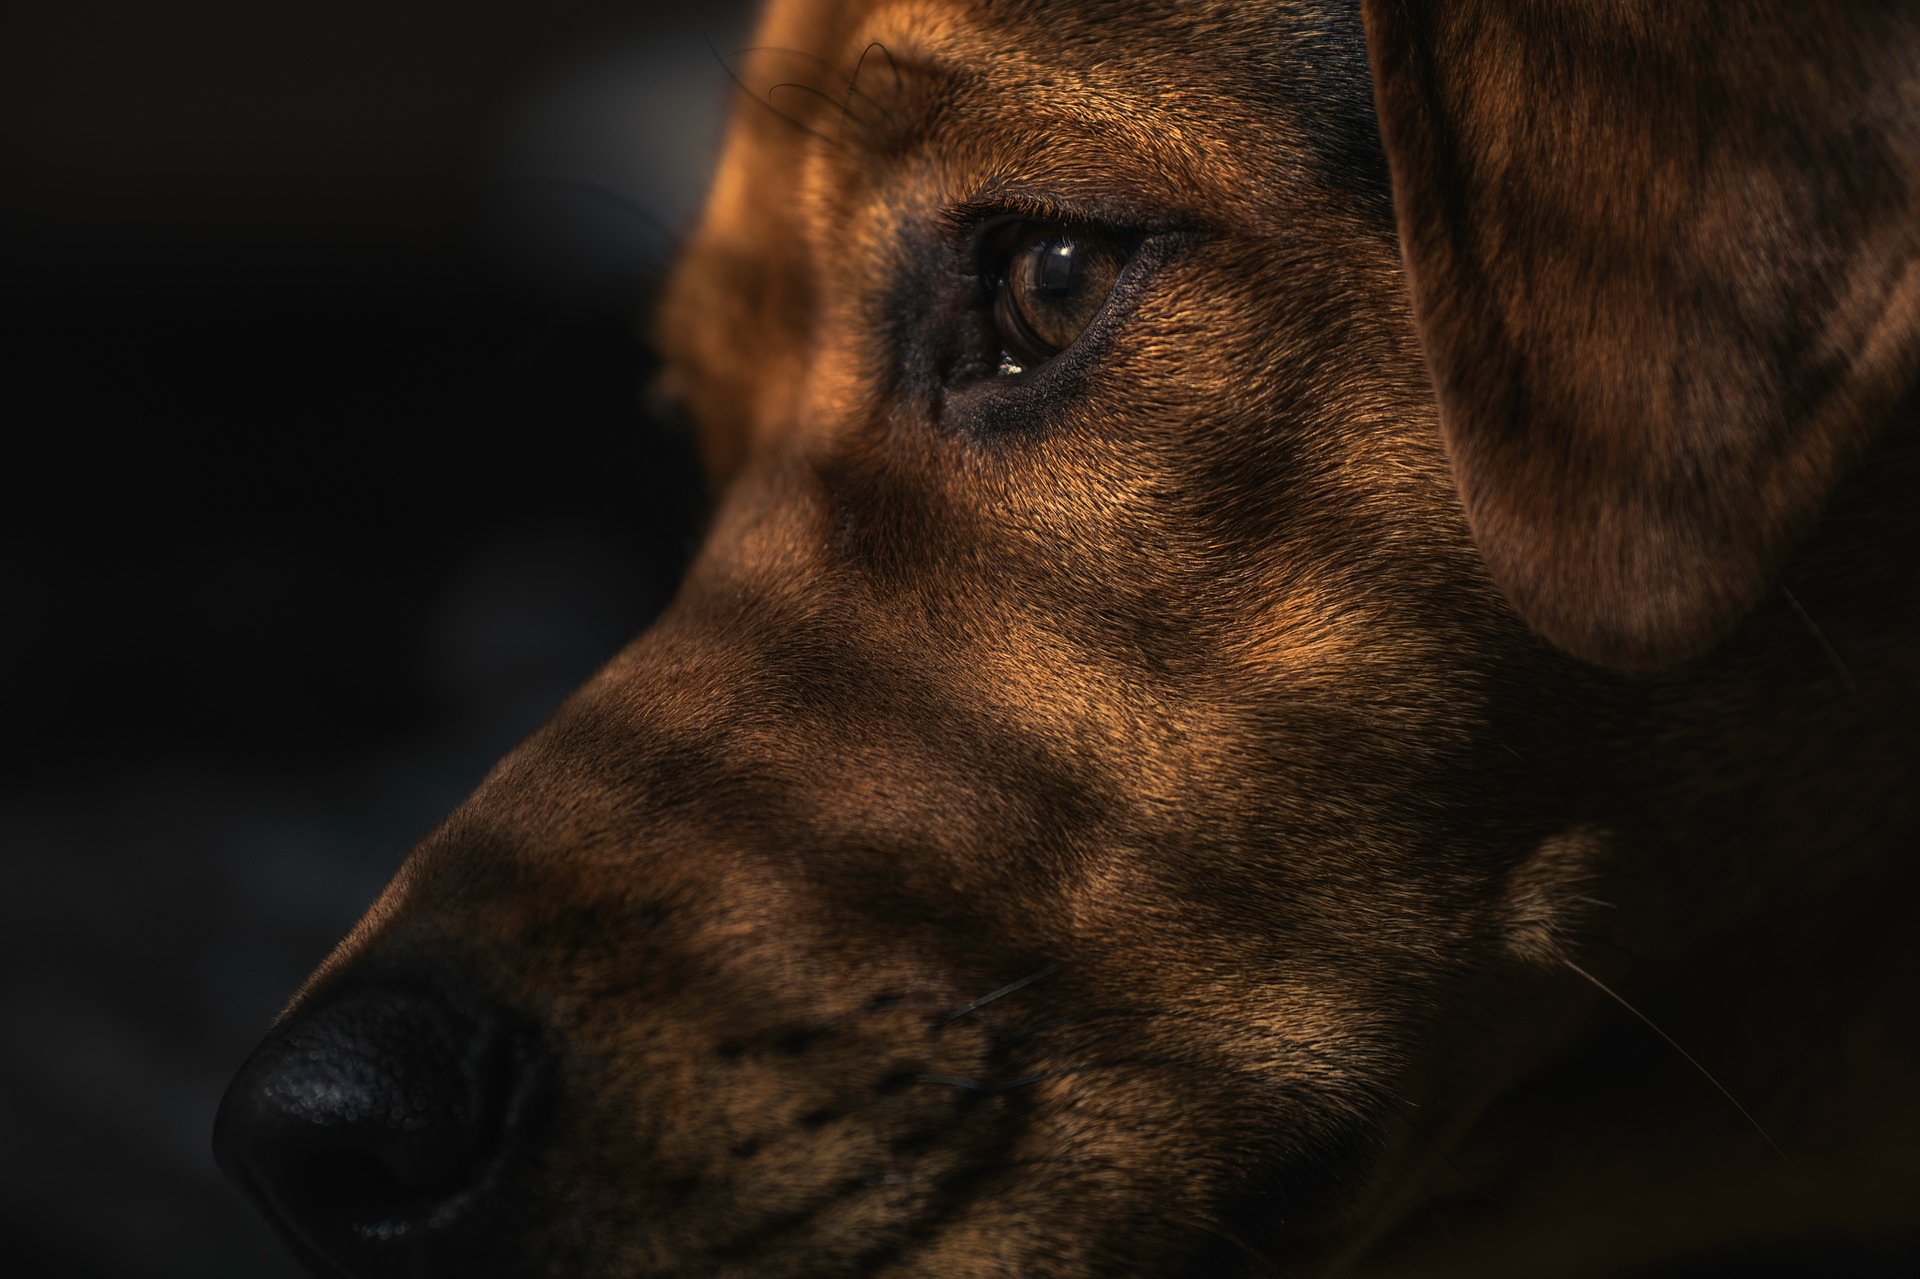 dog-1149188_1920_1531246314256.jpg